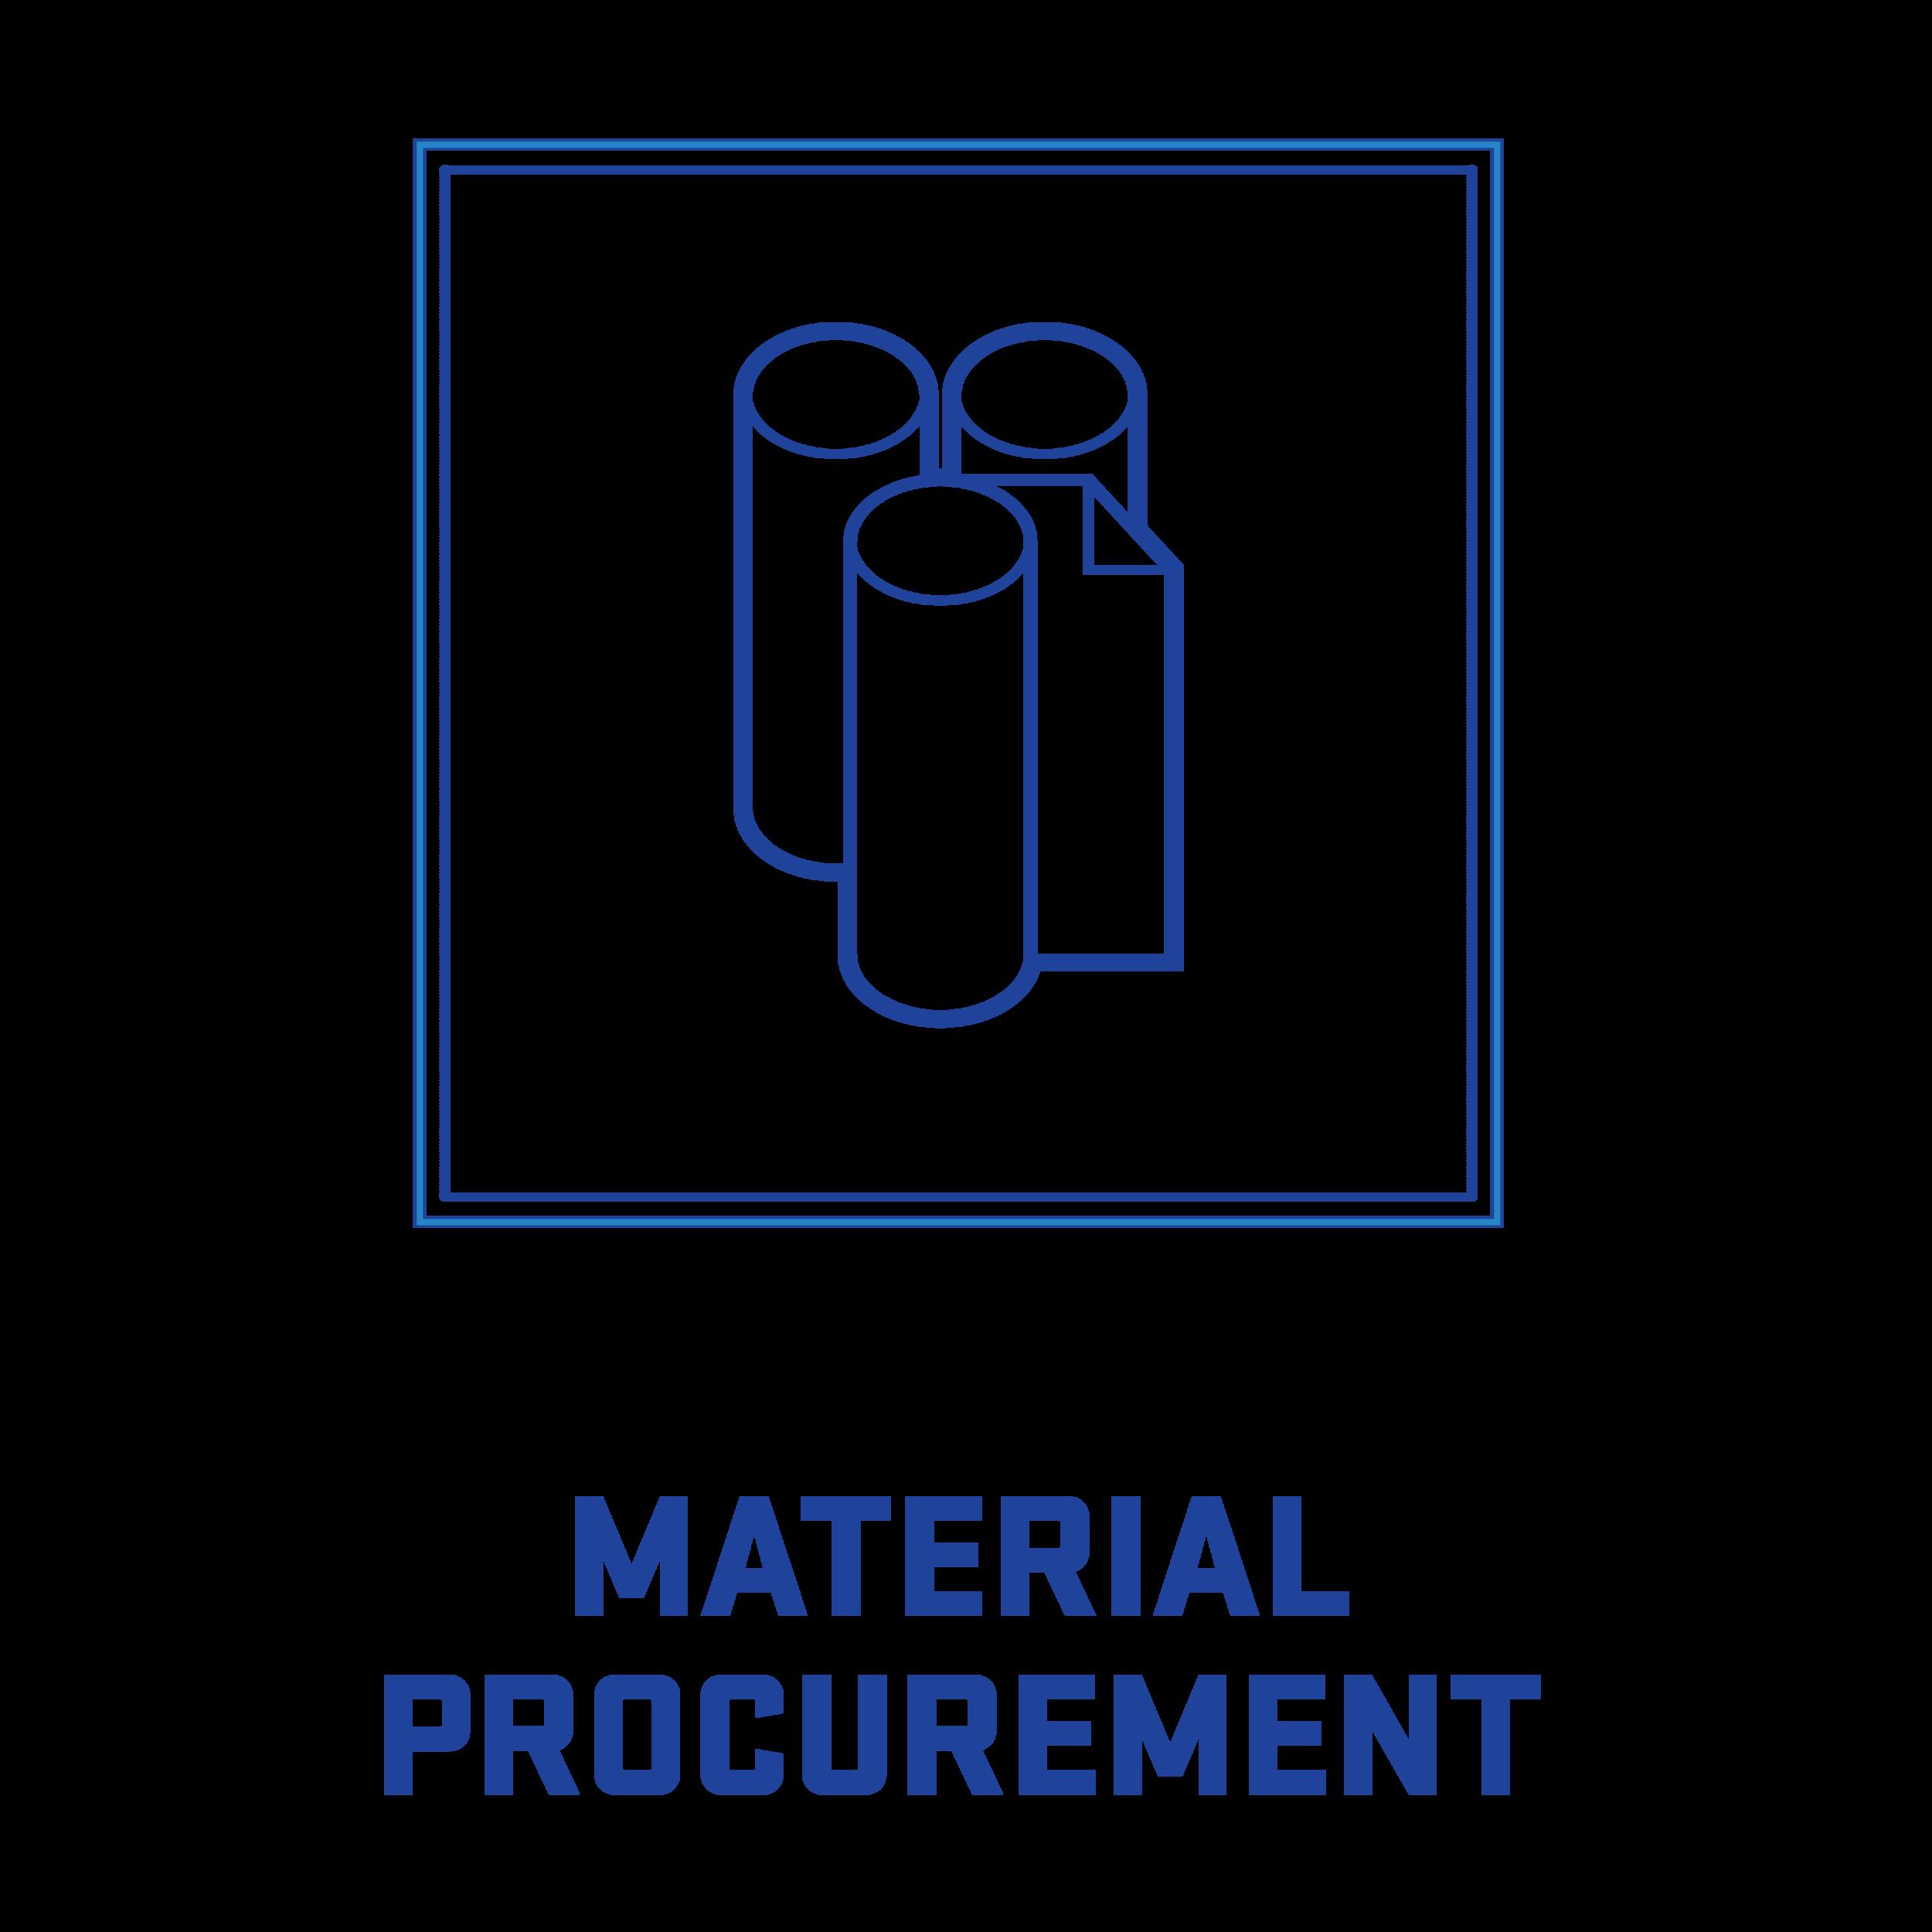 Material Procurement